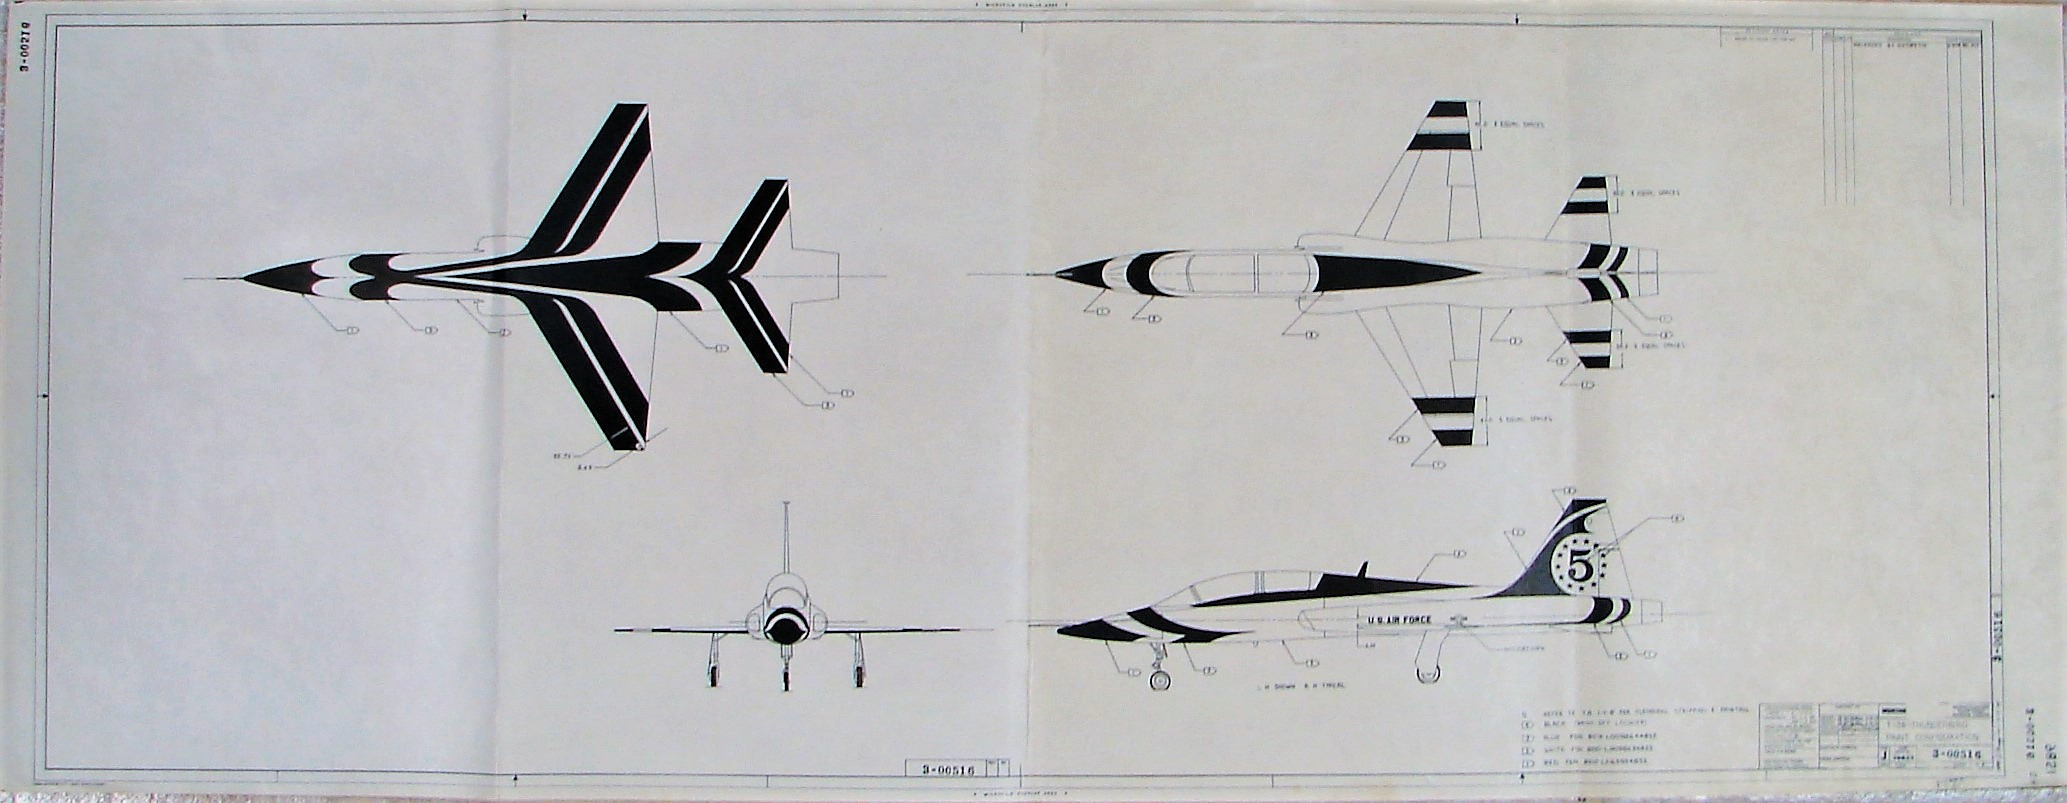 T-38 USAF Thunderbird 3.14.1974